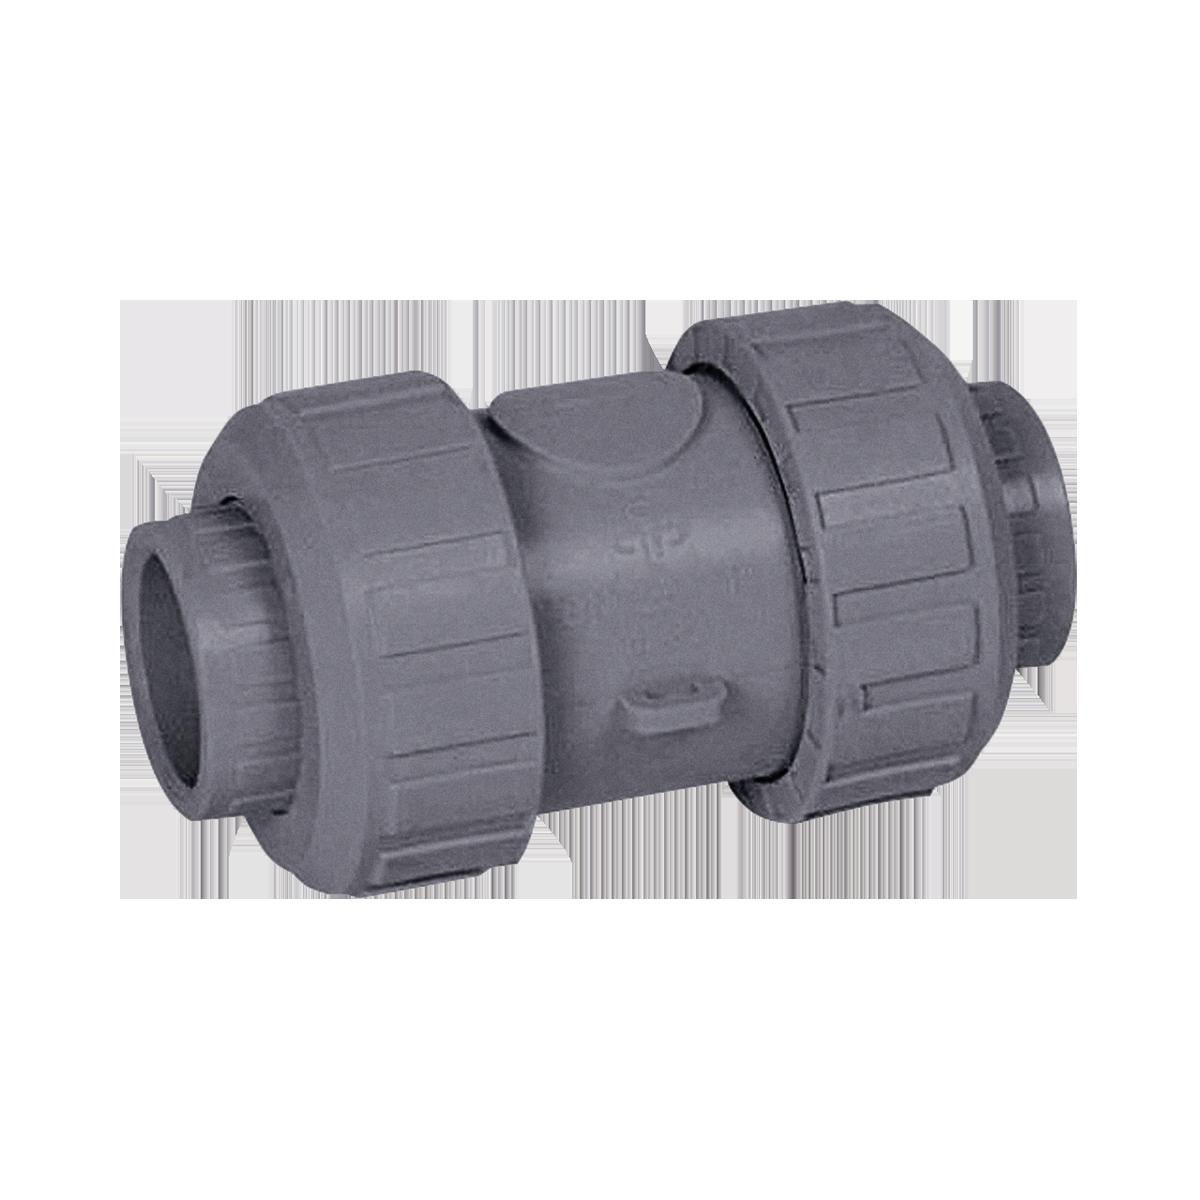 Praher cone check valve S4 PVC-C, grey